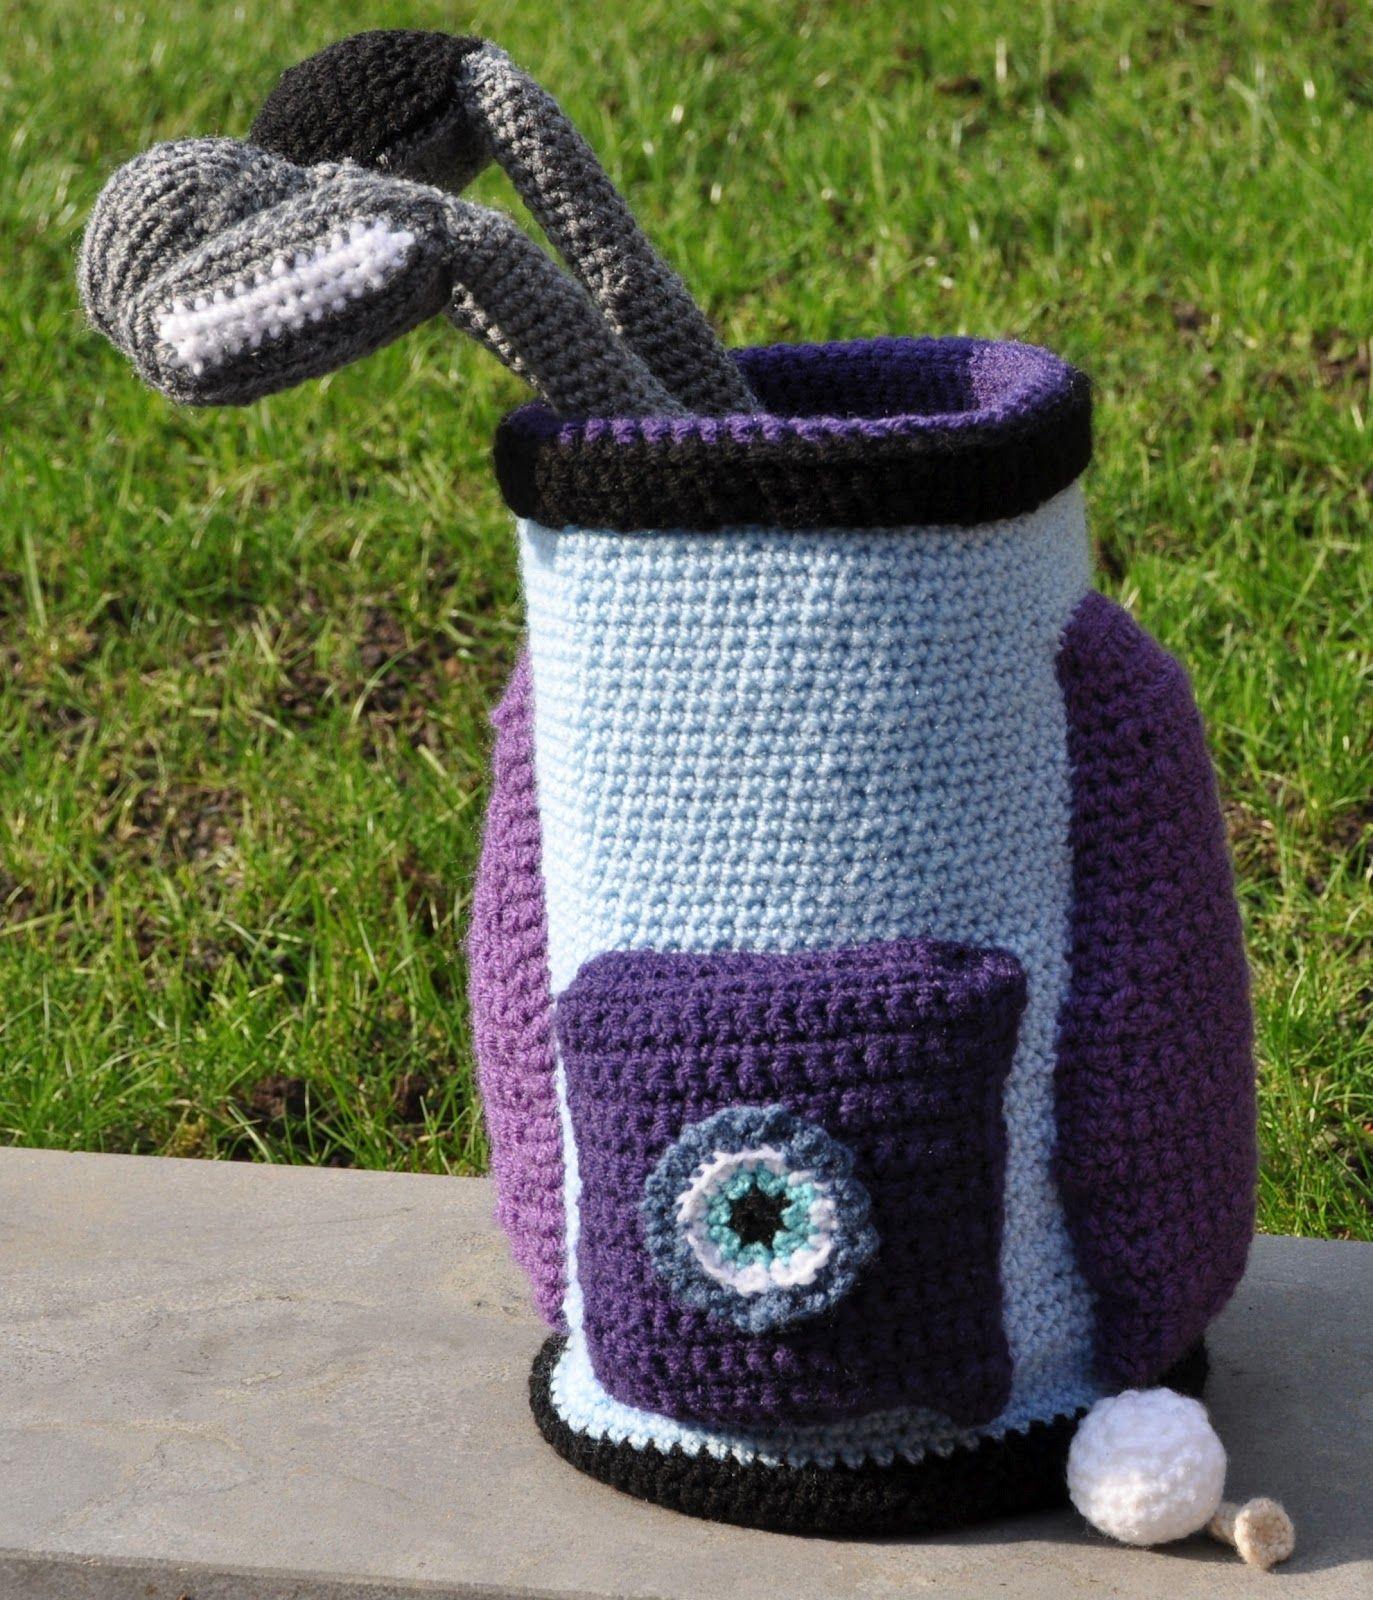 Crochet golf set | My Crochet Projects | Pinterest